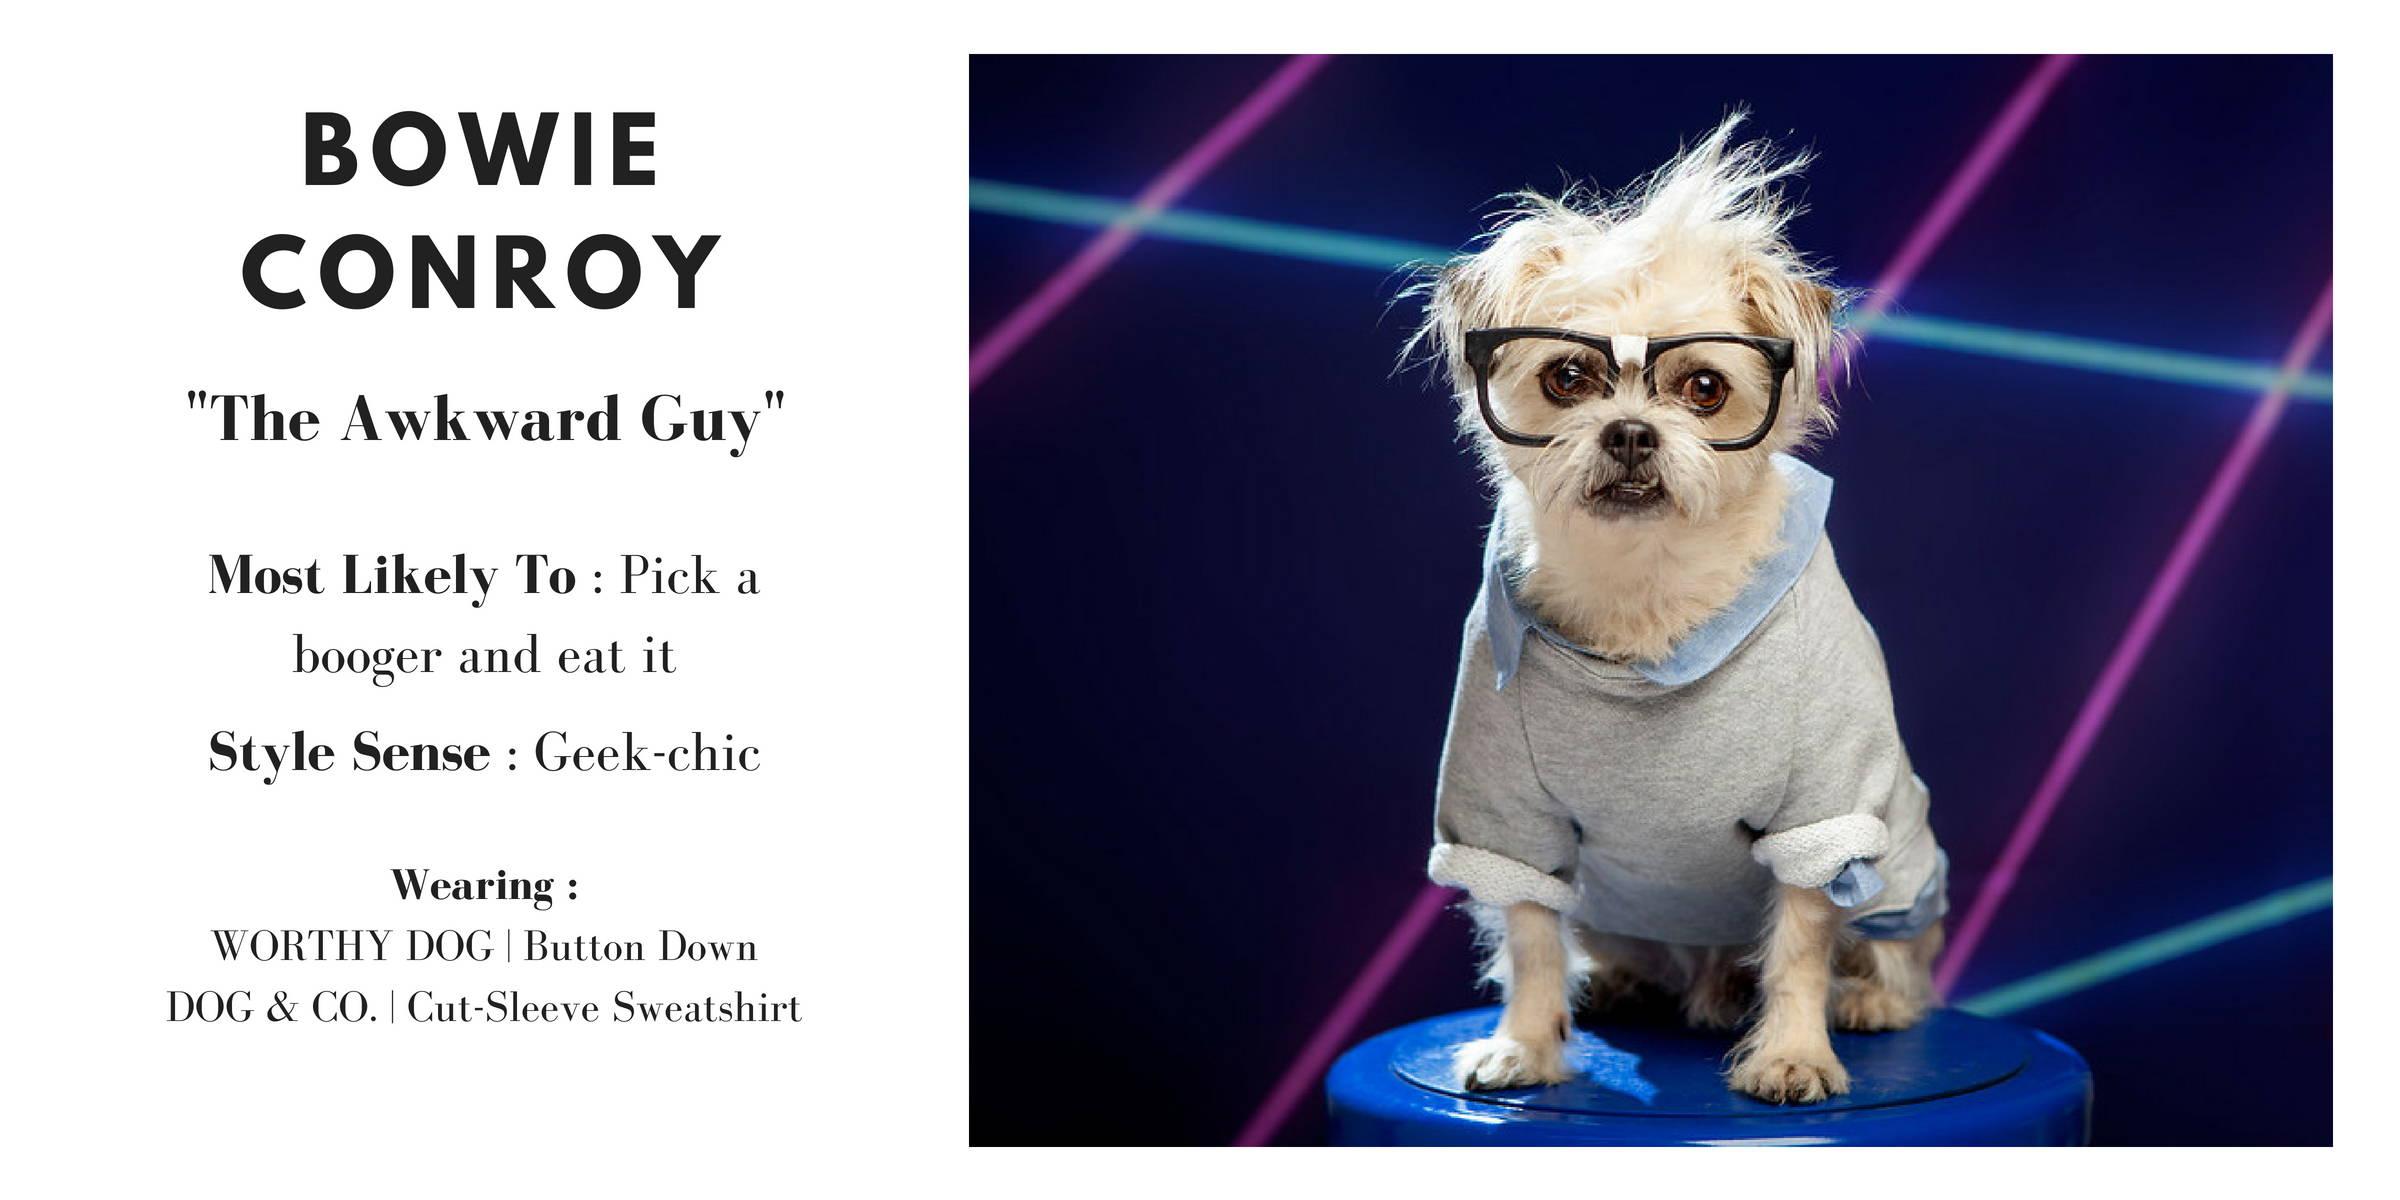 BOWIE CONROY wearing the WORTHY DOG | Button Down & DOG & CO. | Cut-Sleeve Sweatshirt